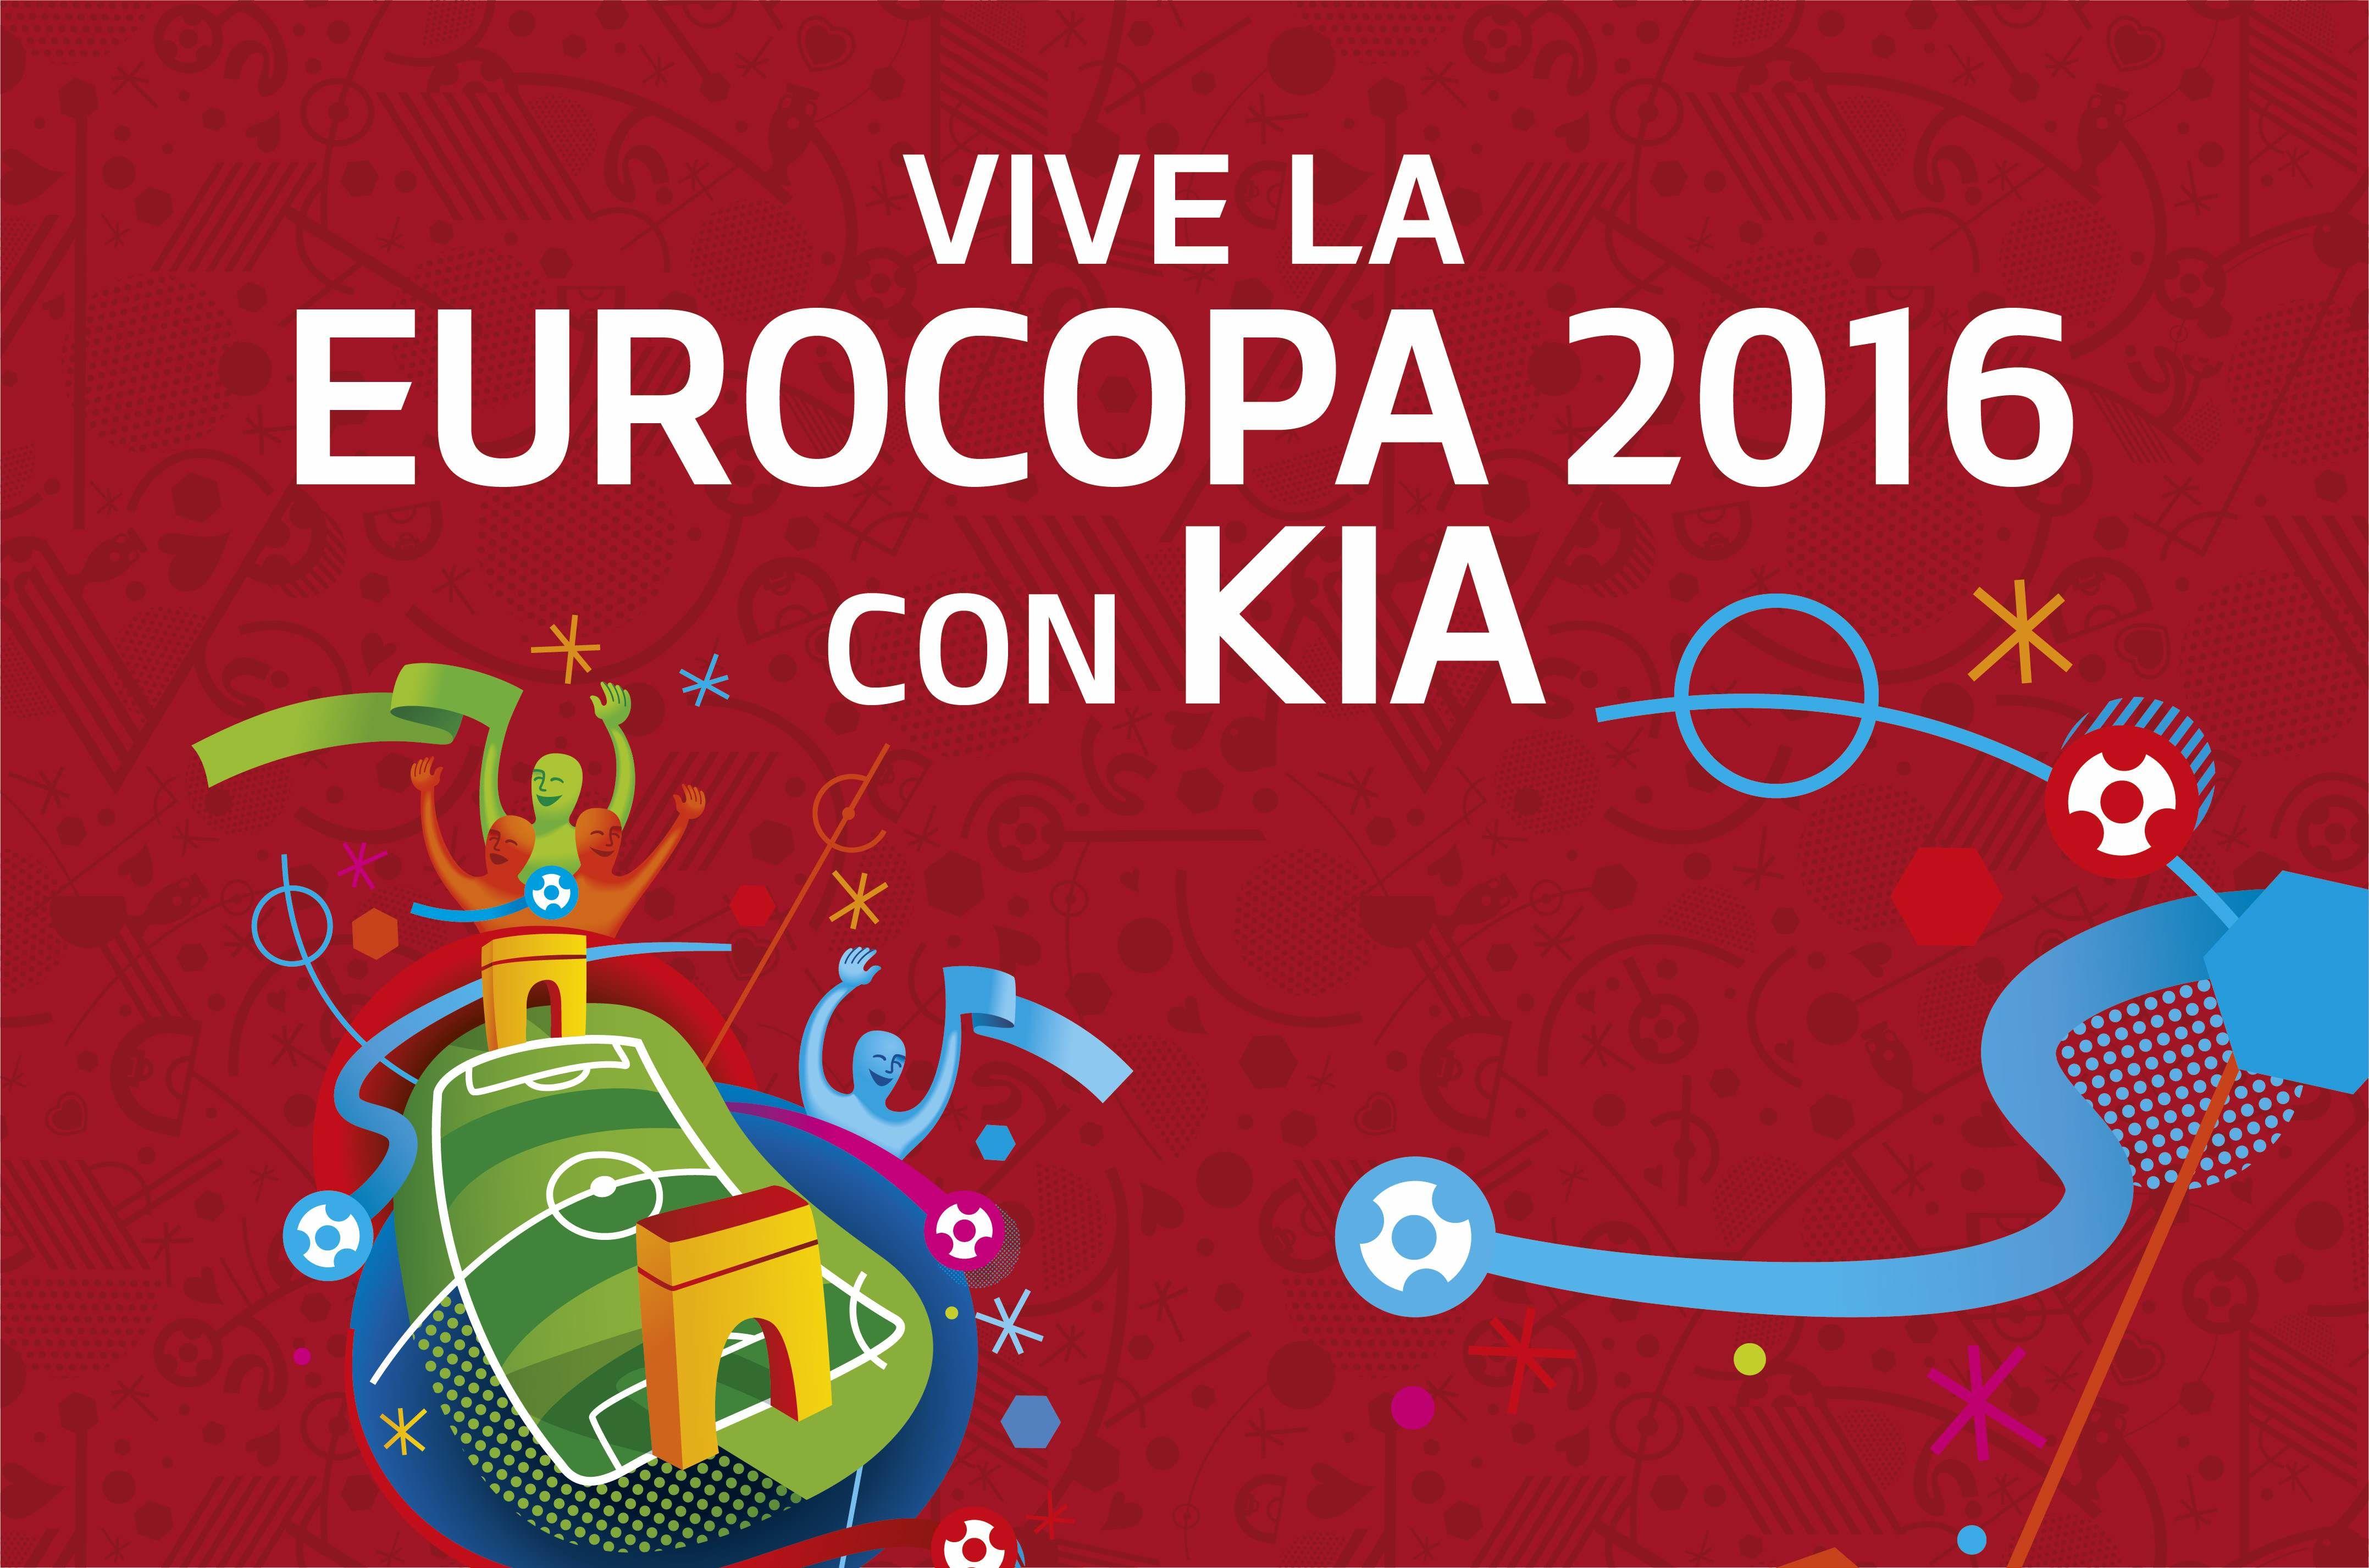 Cumple tu sueño: Vive la Eurocopa 2016 con Kia